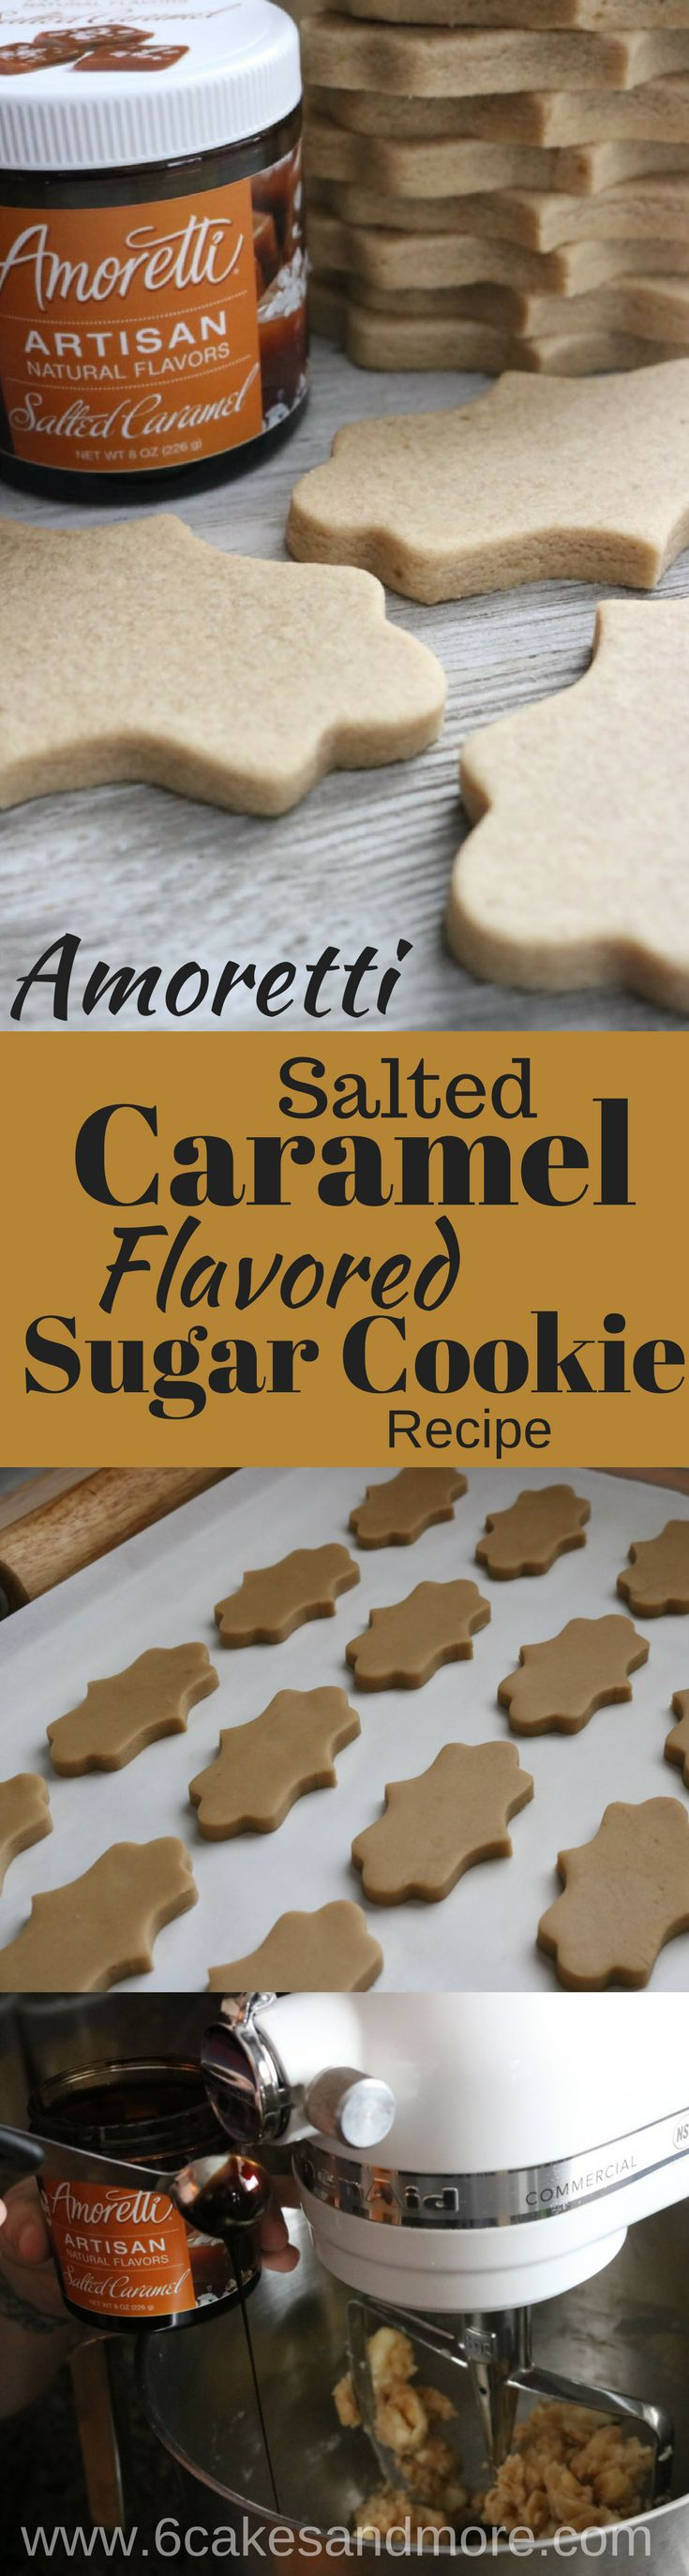 Salted Caramel No Chill No Spread Sugar Cookies! #recipe #saltedcaramel #sugarcookies #nospread